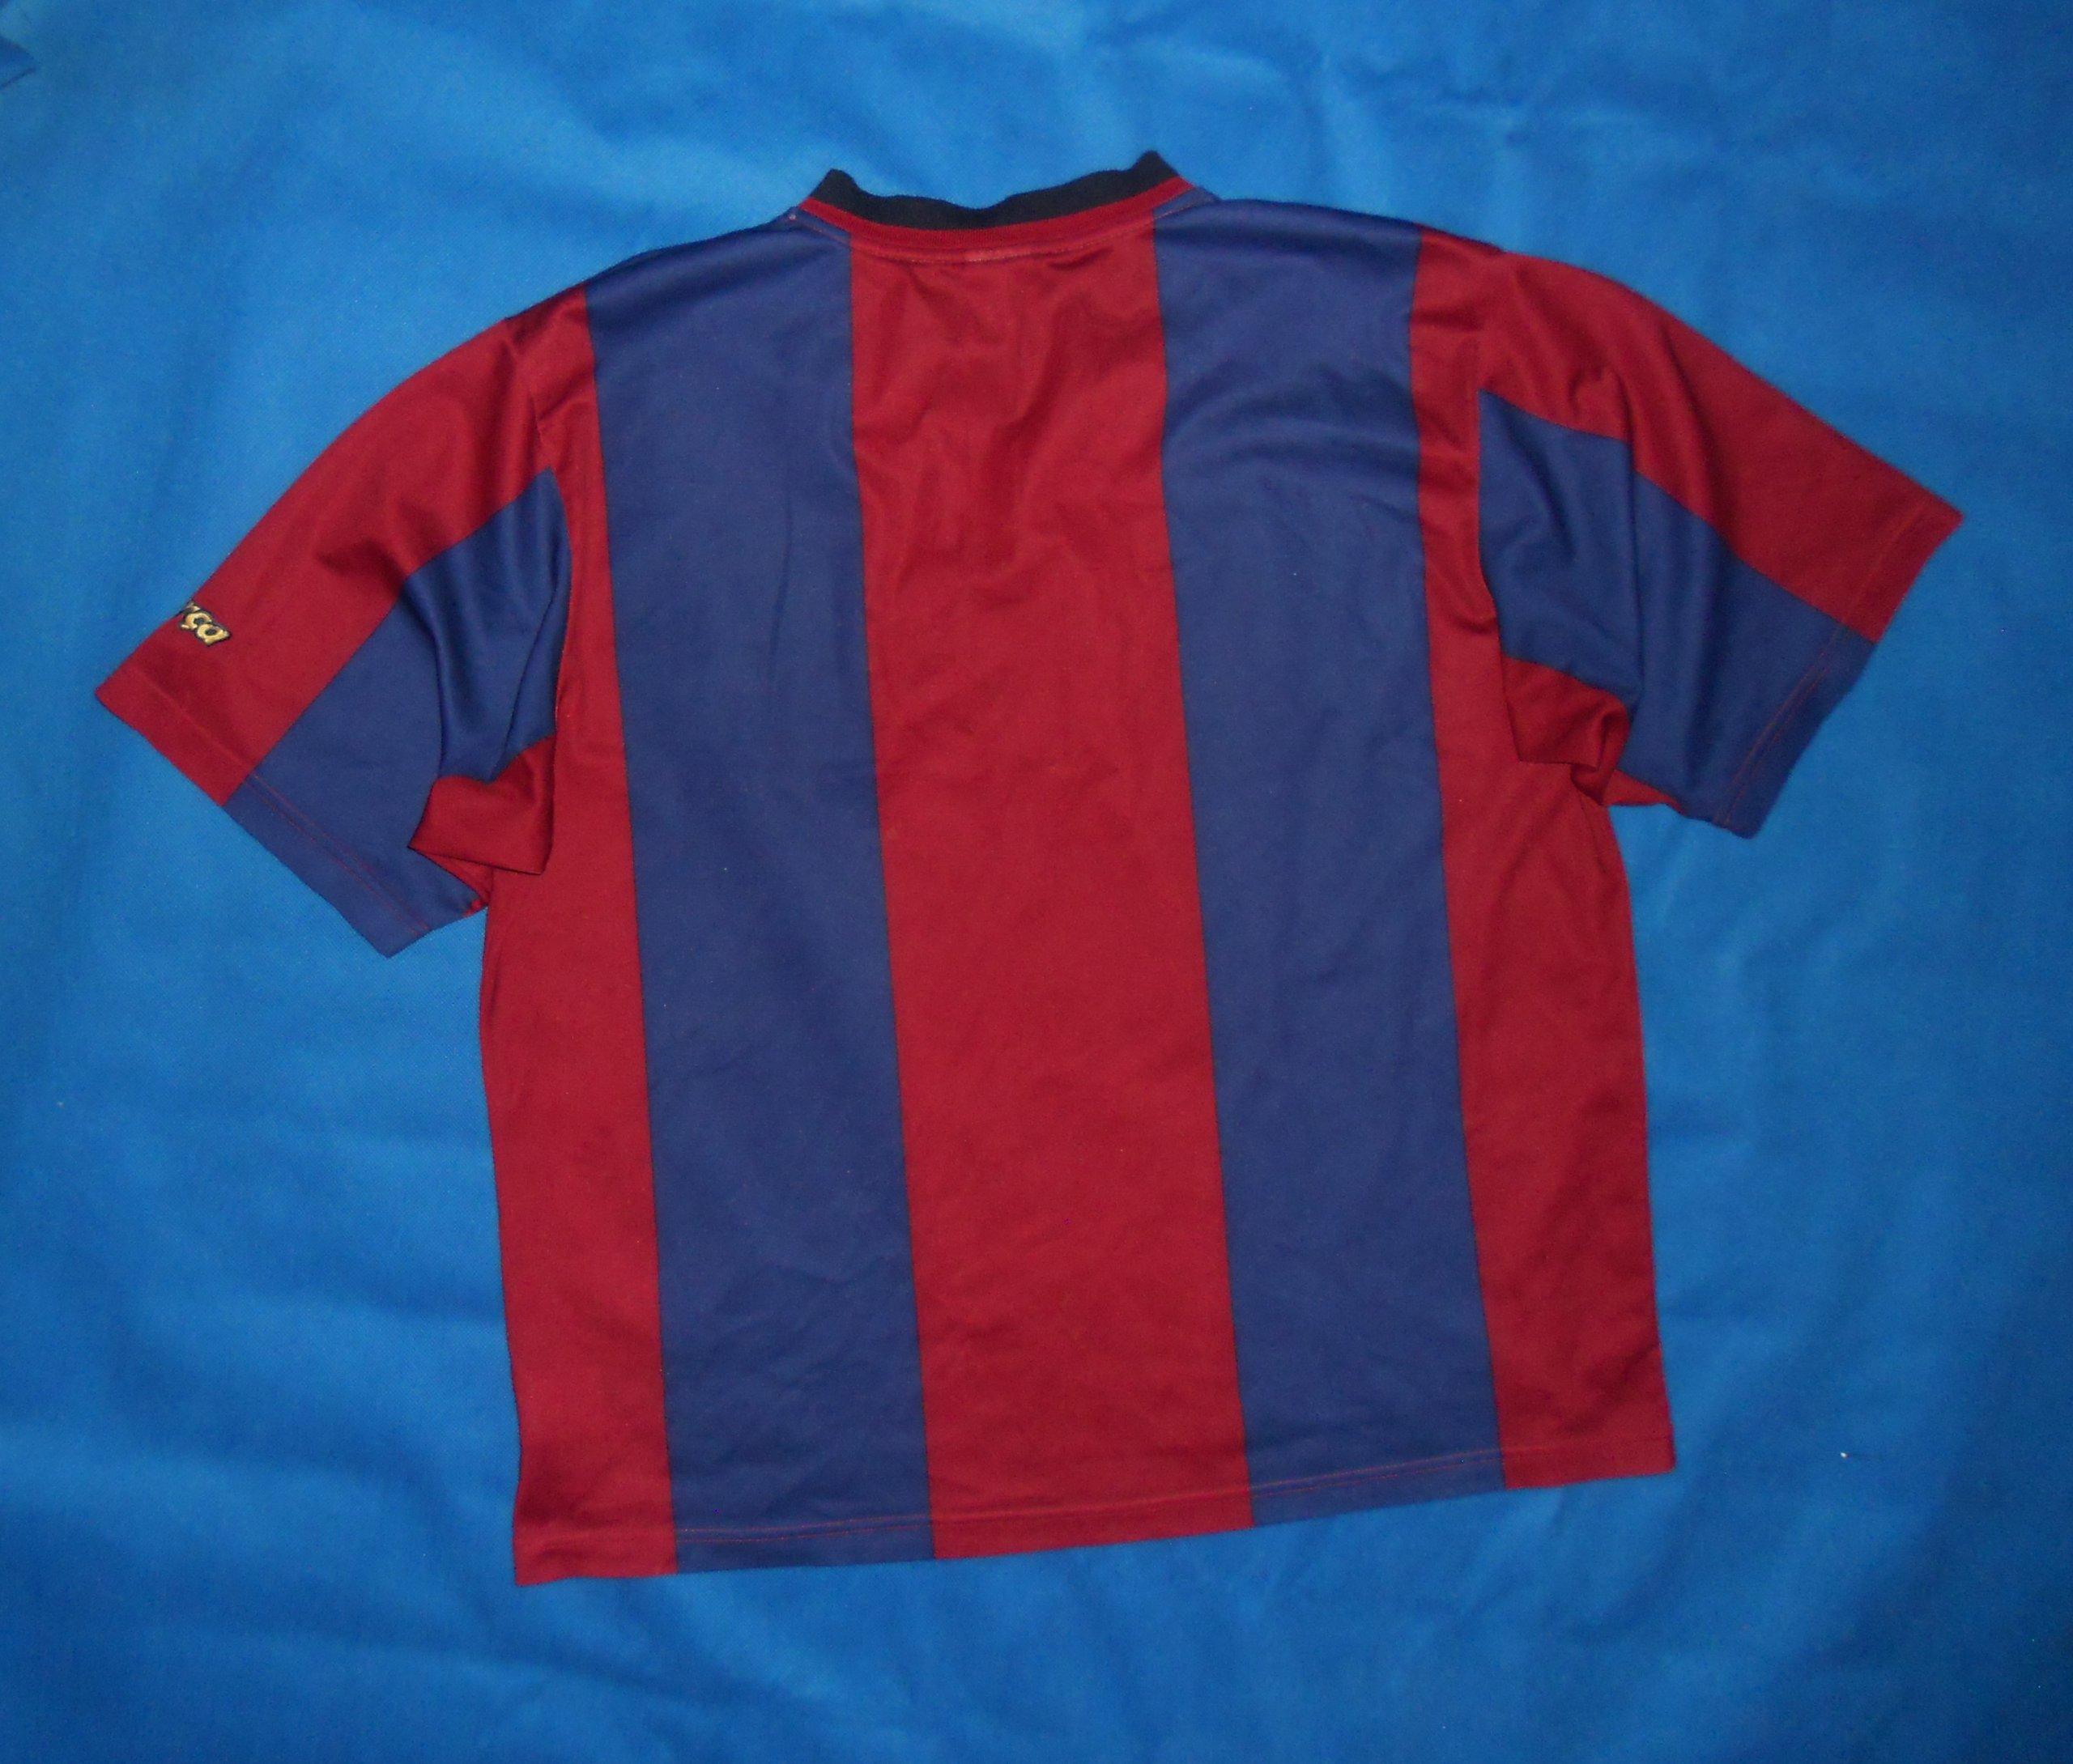 e9a0c6786 FC Barcelona Nike Home Shirt 1998 99 Unikat XL - 7464604155 ...